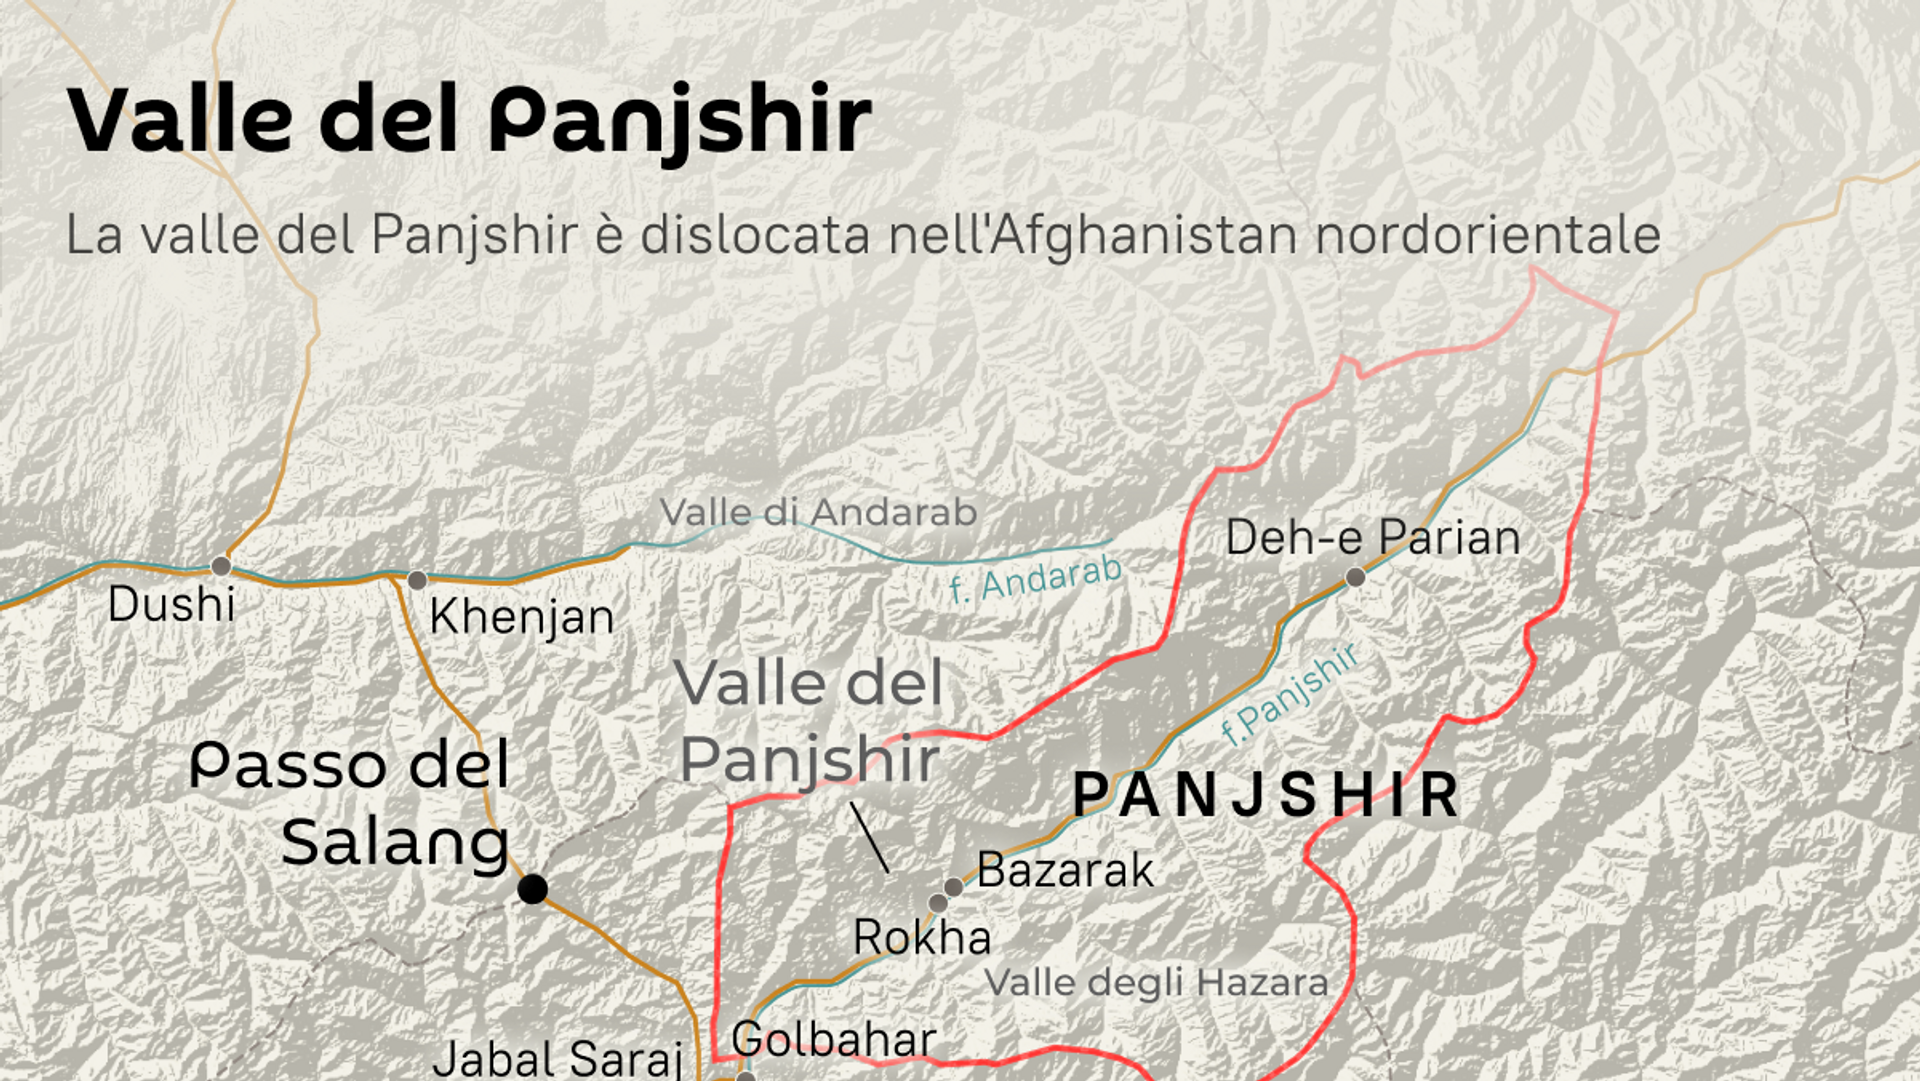 Valle del Panjshir - Sputnik Italia, 1920, 08.09.2021